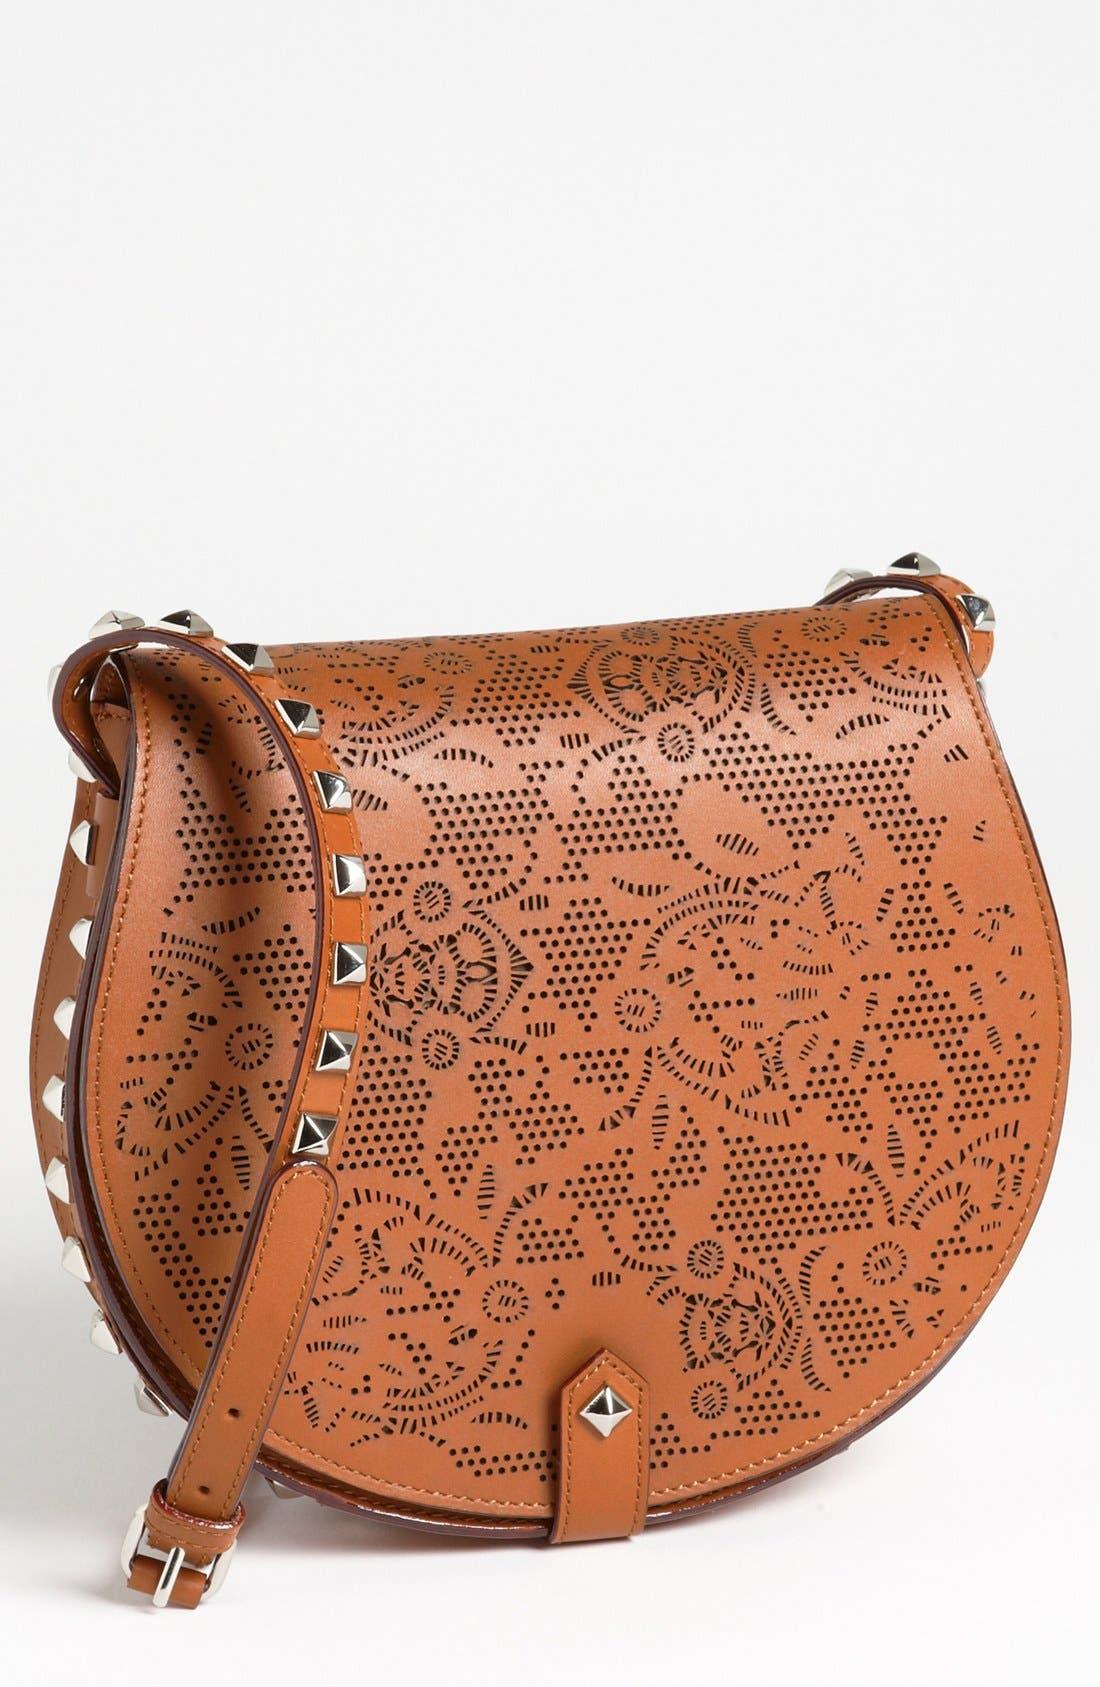 Alternate Image 1 Selected - Rebecca Minkoff 'Skylar' Crossbody Bag